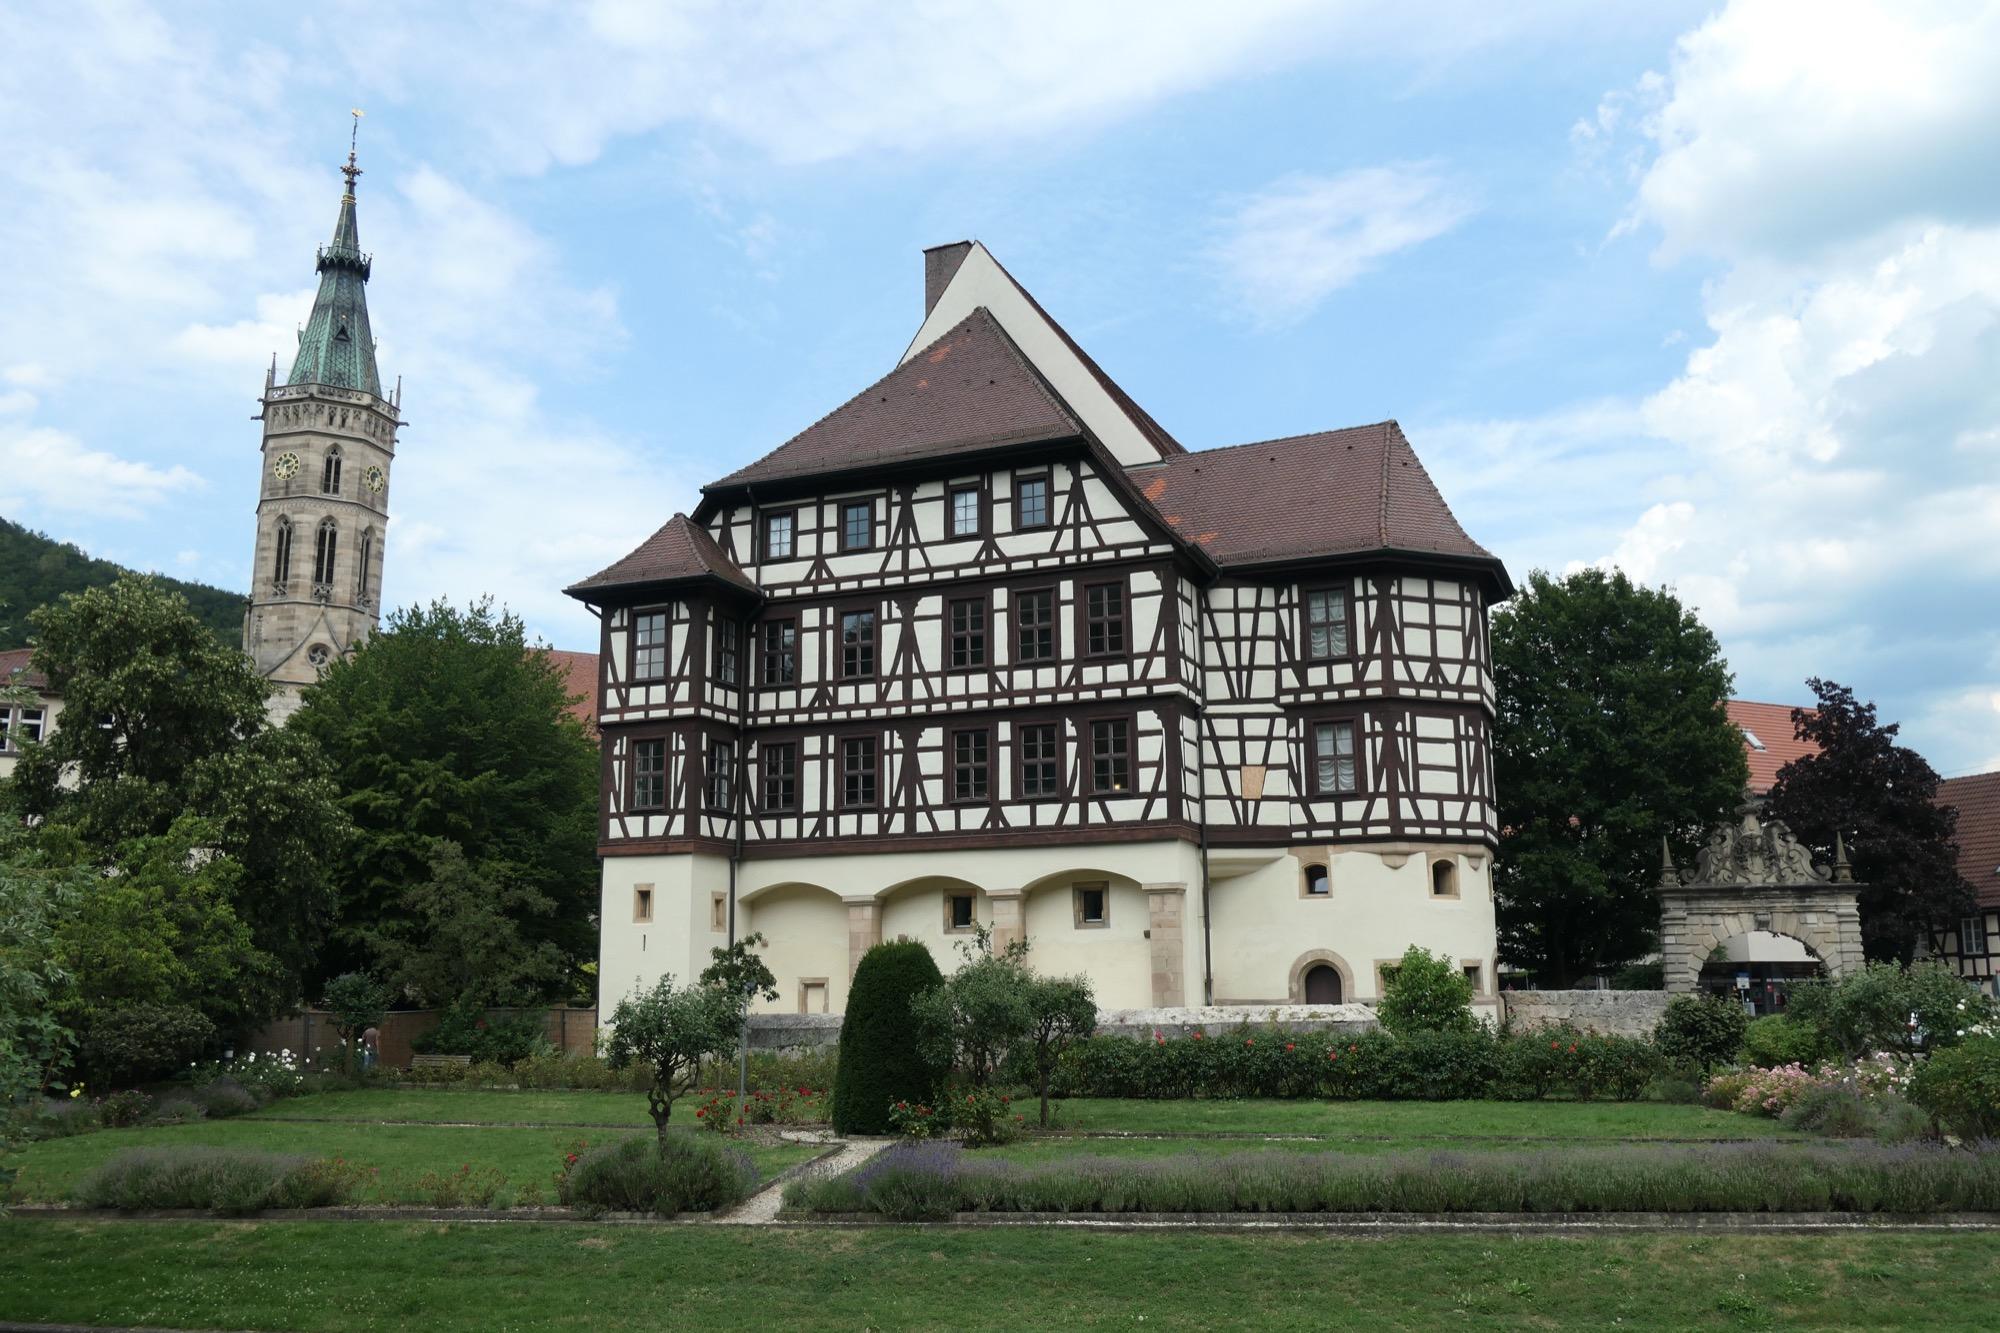 Urach Residential Palace